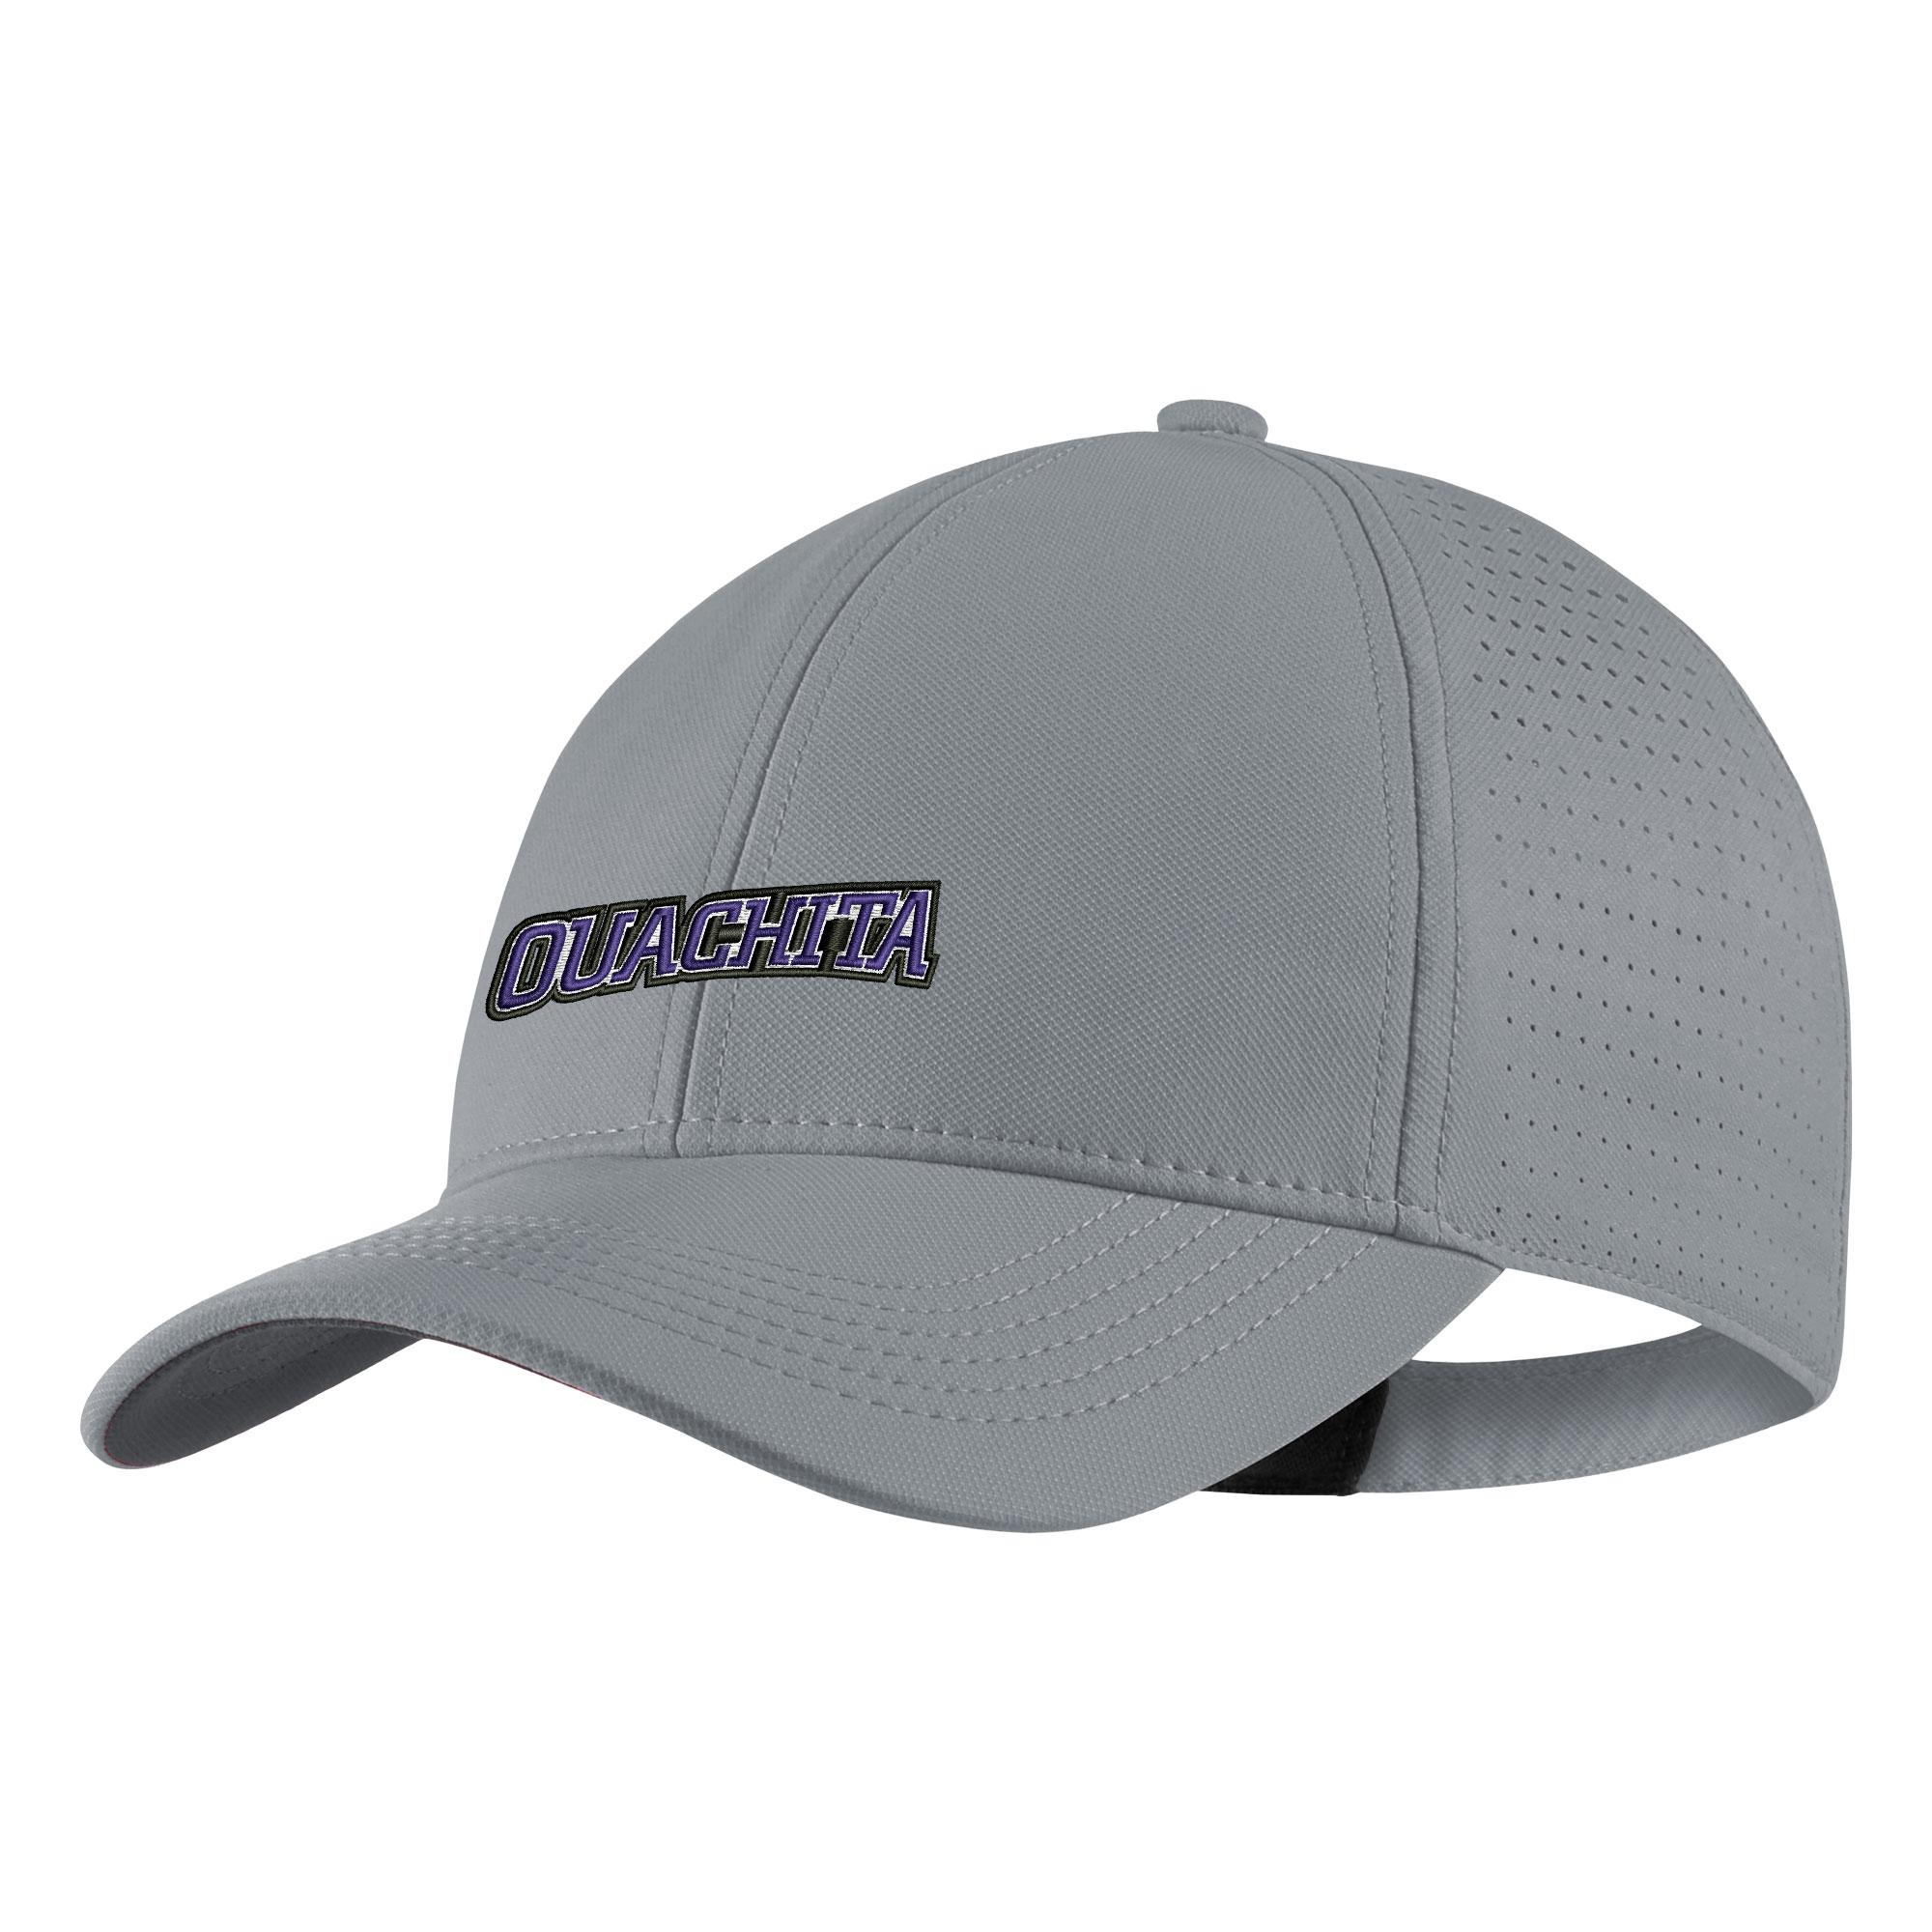 OUACHITA GOLF LEGACY CAP